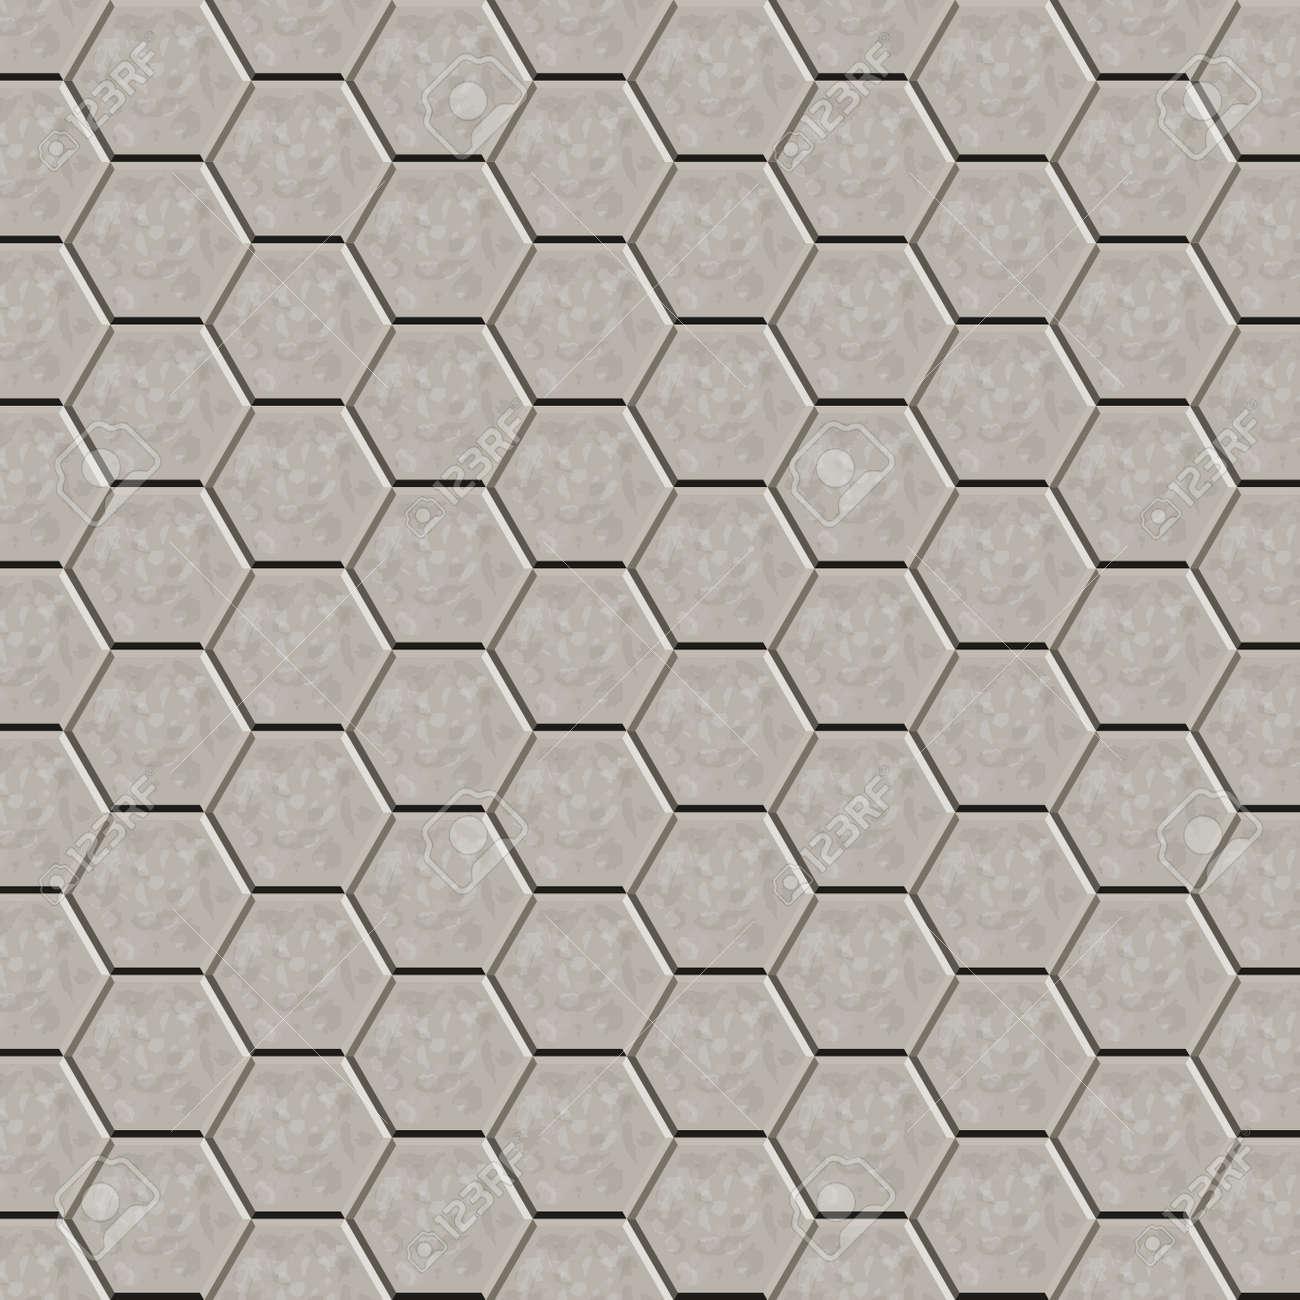 Hexagon Tiles Pattern For Decoration And Design Tile Floor ...